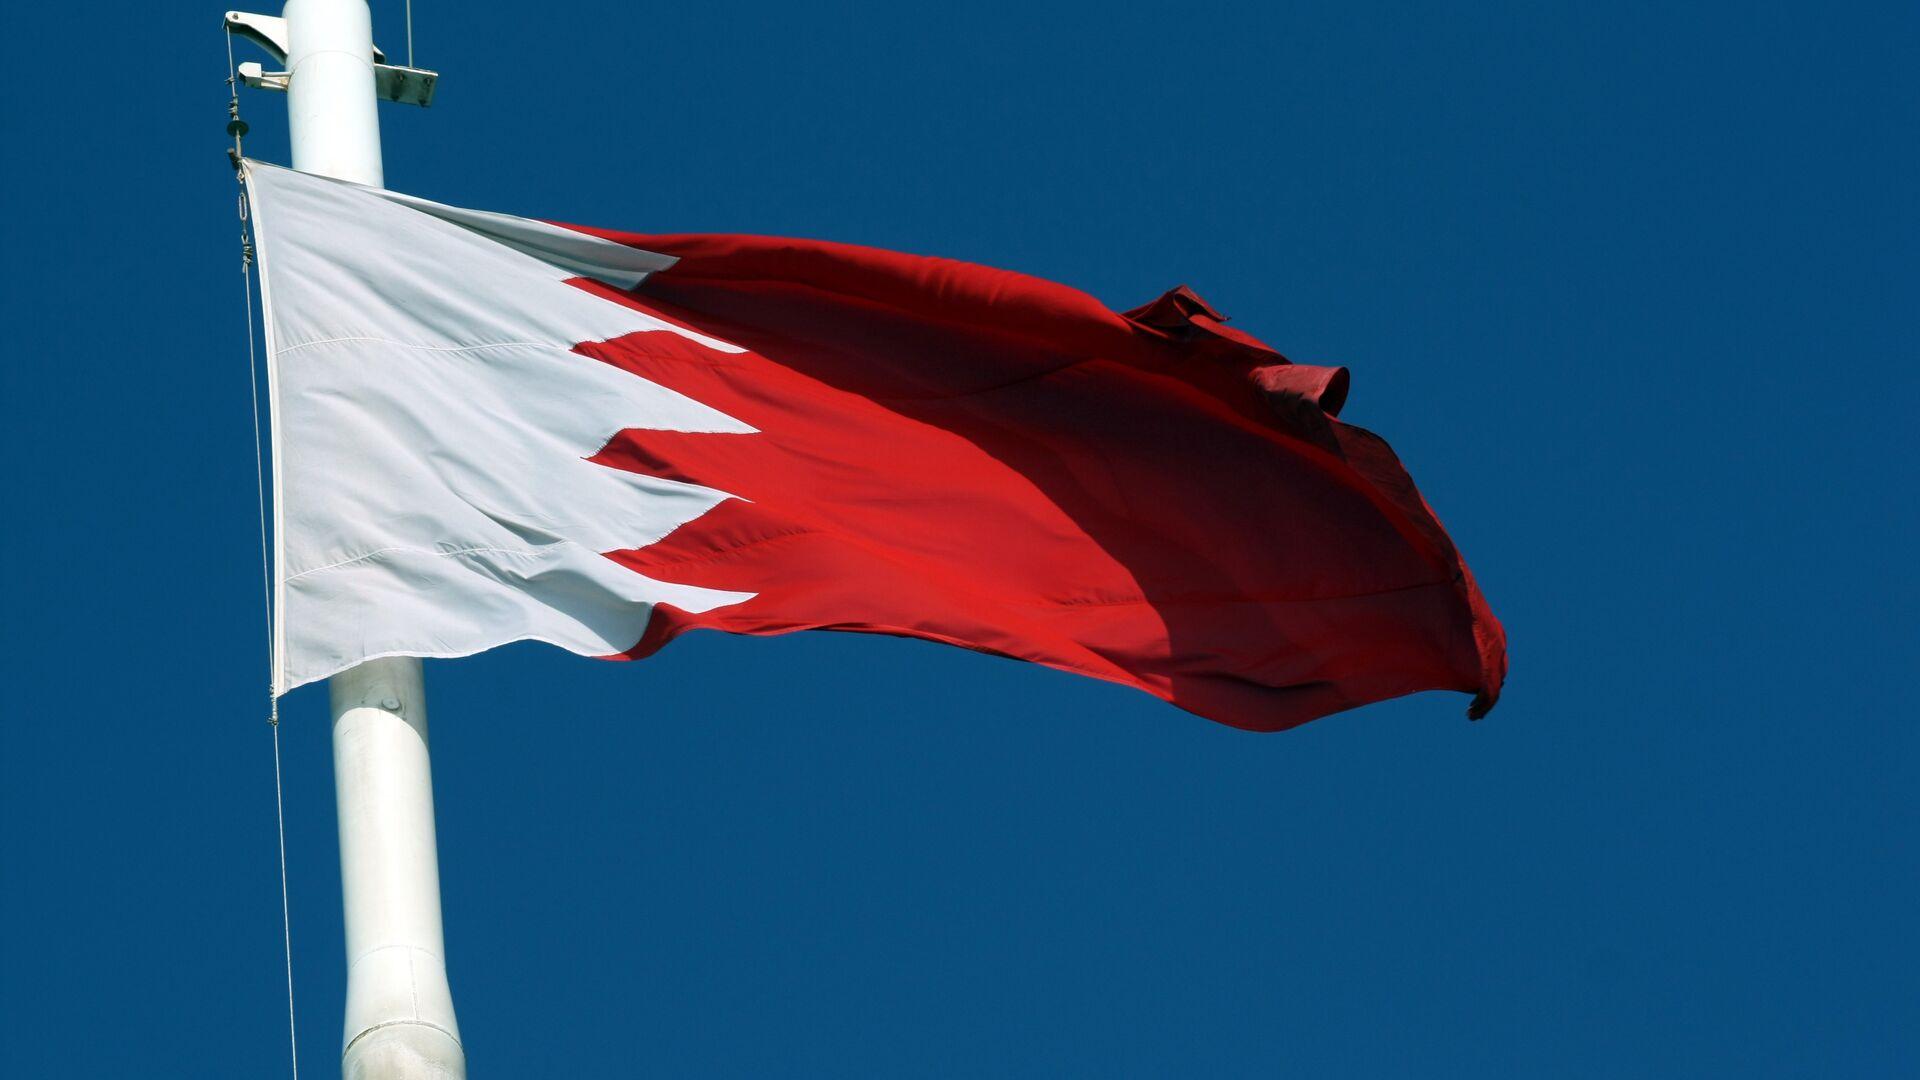 Bandera de Bahréin - Sputnik Mundo, 1920, 11.05.2021